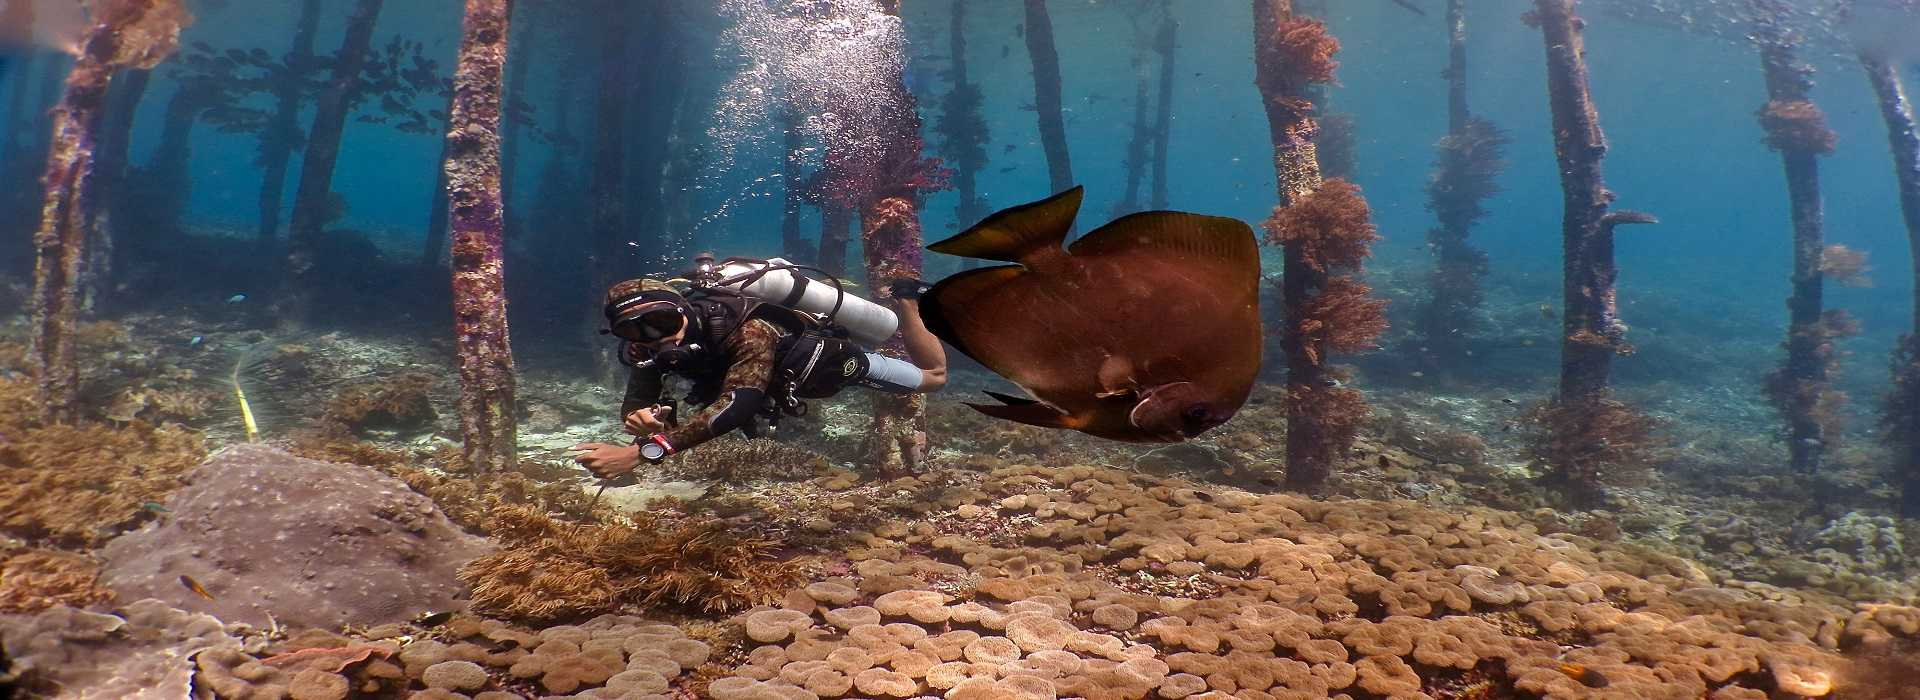 Plongée / chasse sous marine (Mitsio)